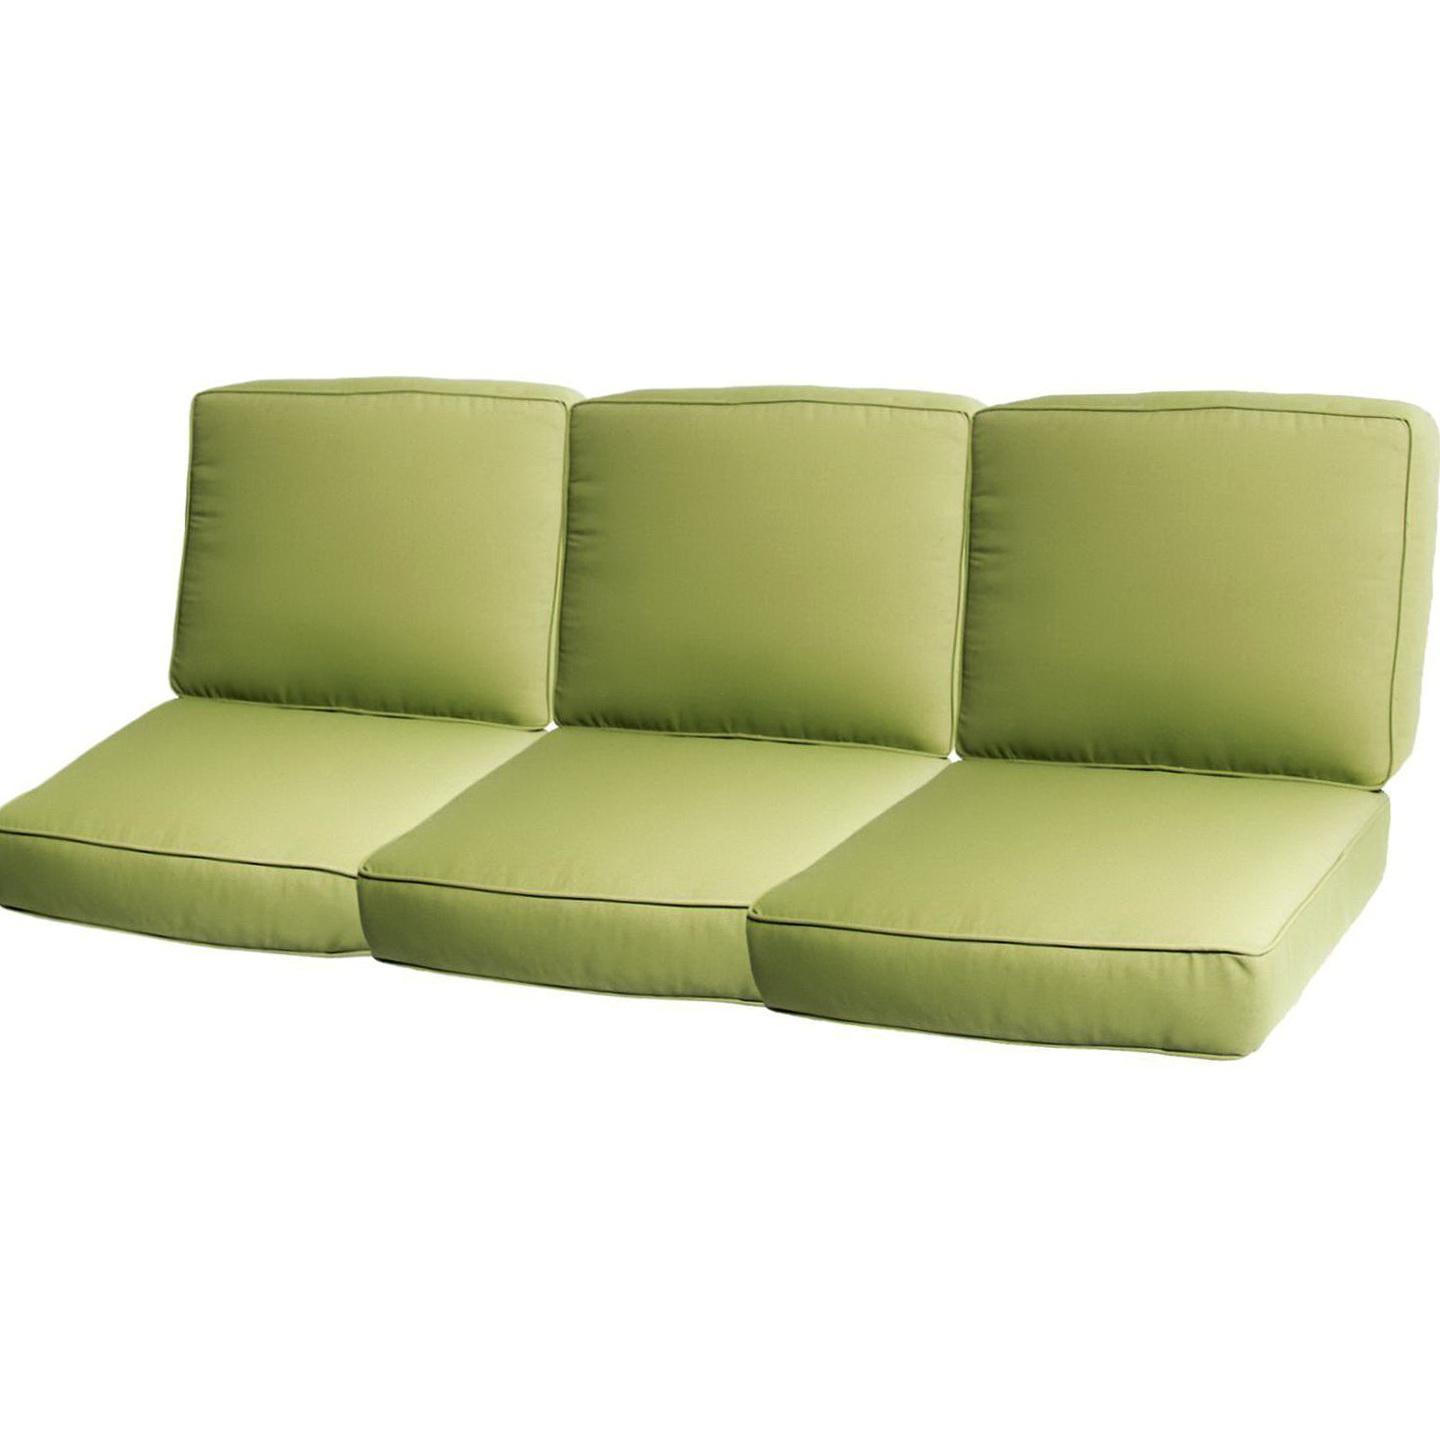 foam for sofa cushions uk cushion repair cost replace home design ideas